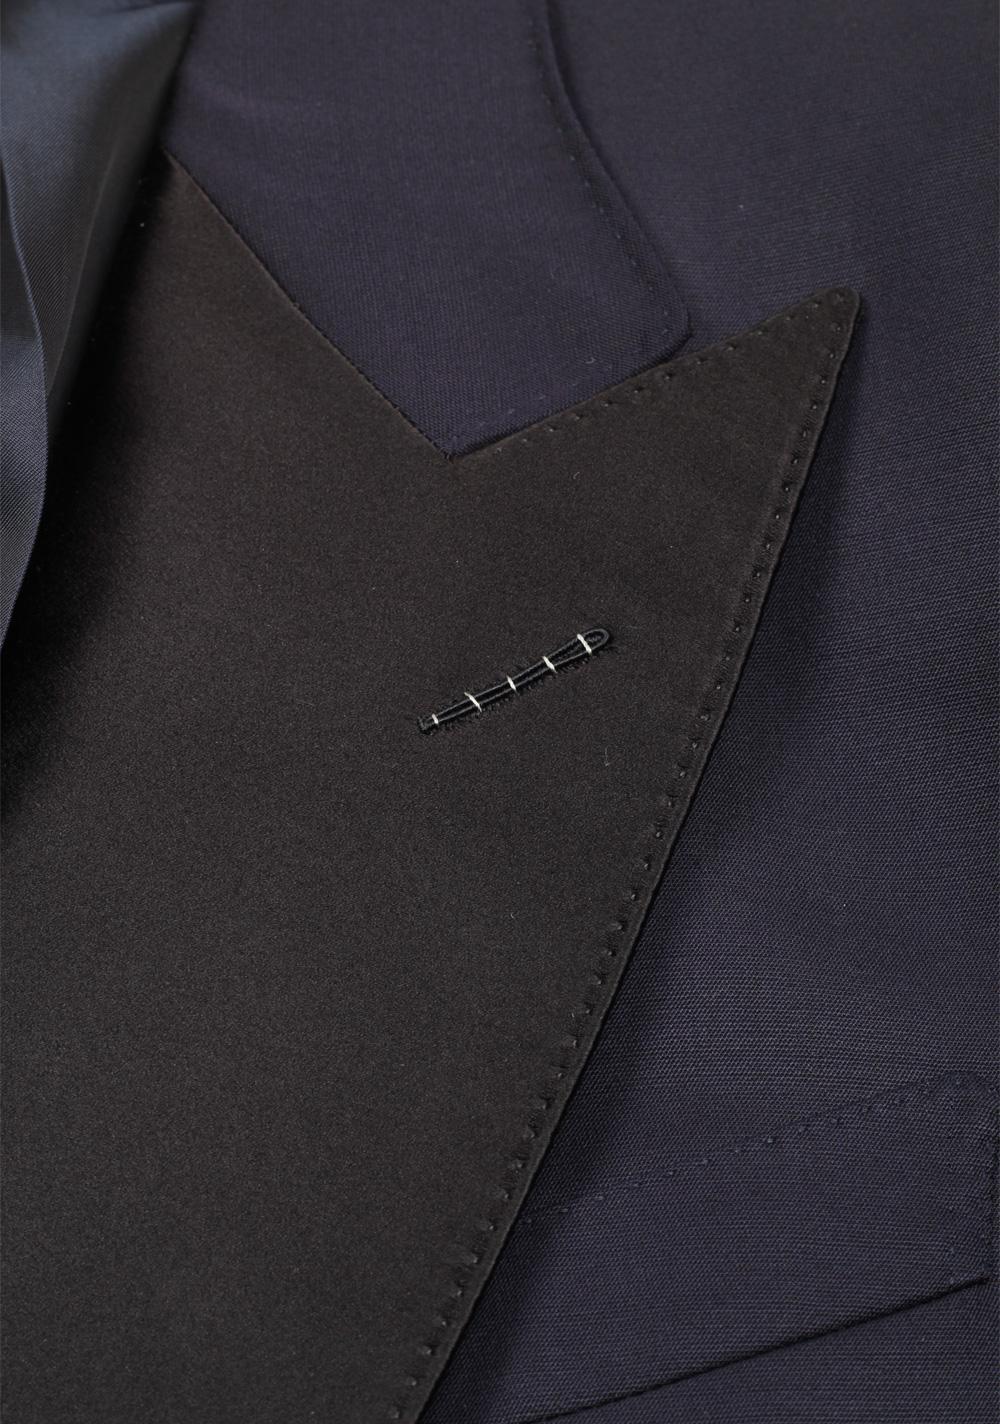 TOM FORD Atticus Midnight Blue Tuxedo Smoking Suit Size 52 / 42R U.S. | Costume Limité